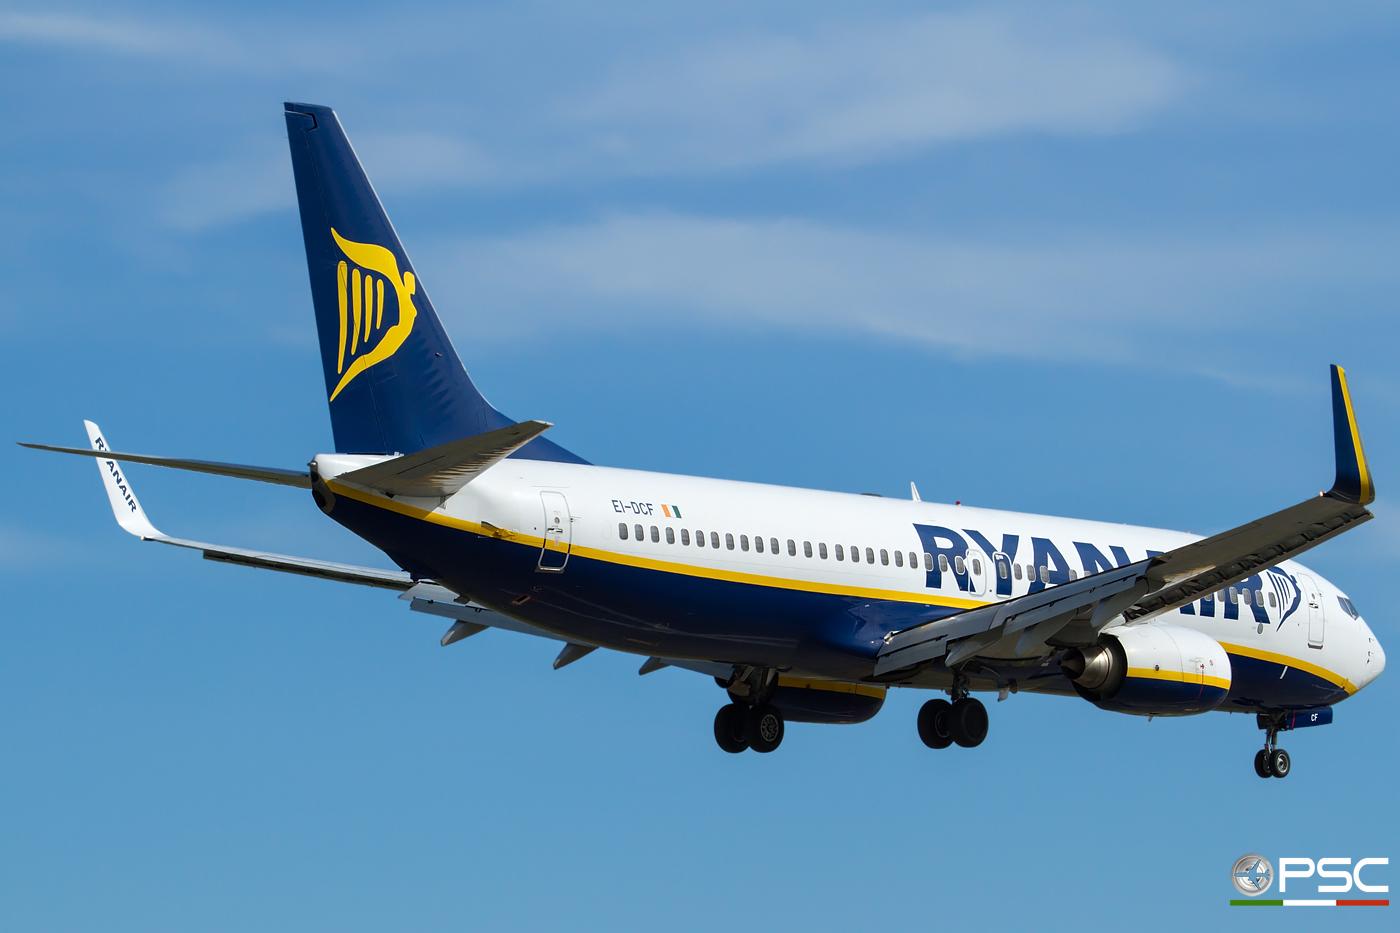 EI-DCF B737-8AS 33804/1529 Ryanair